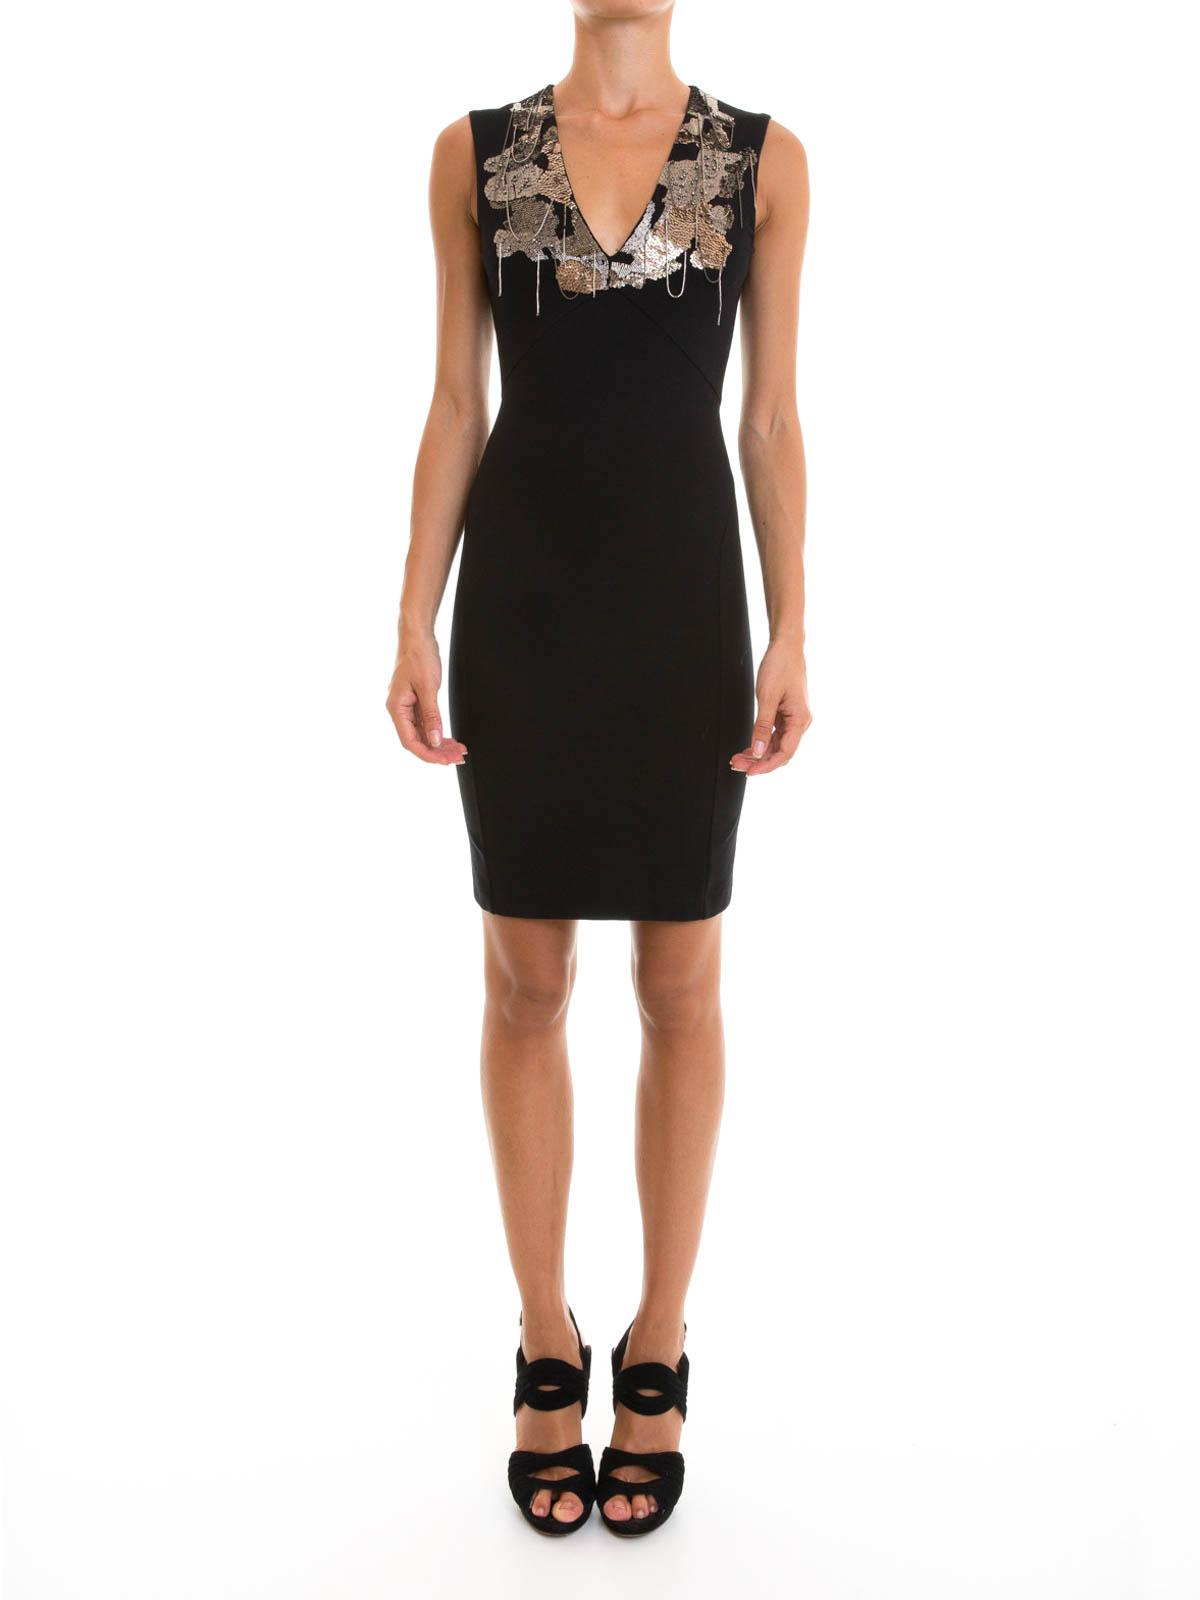 Embellished V-neck sheath dress by Roberto Cavalli - cocktail ...